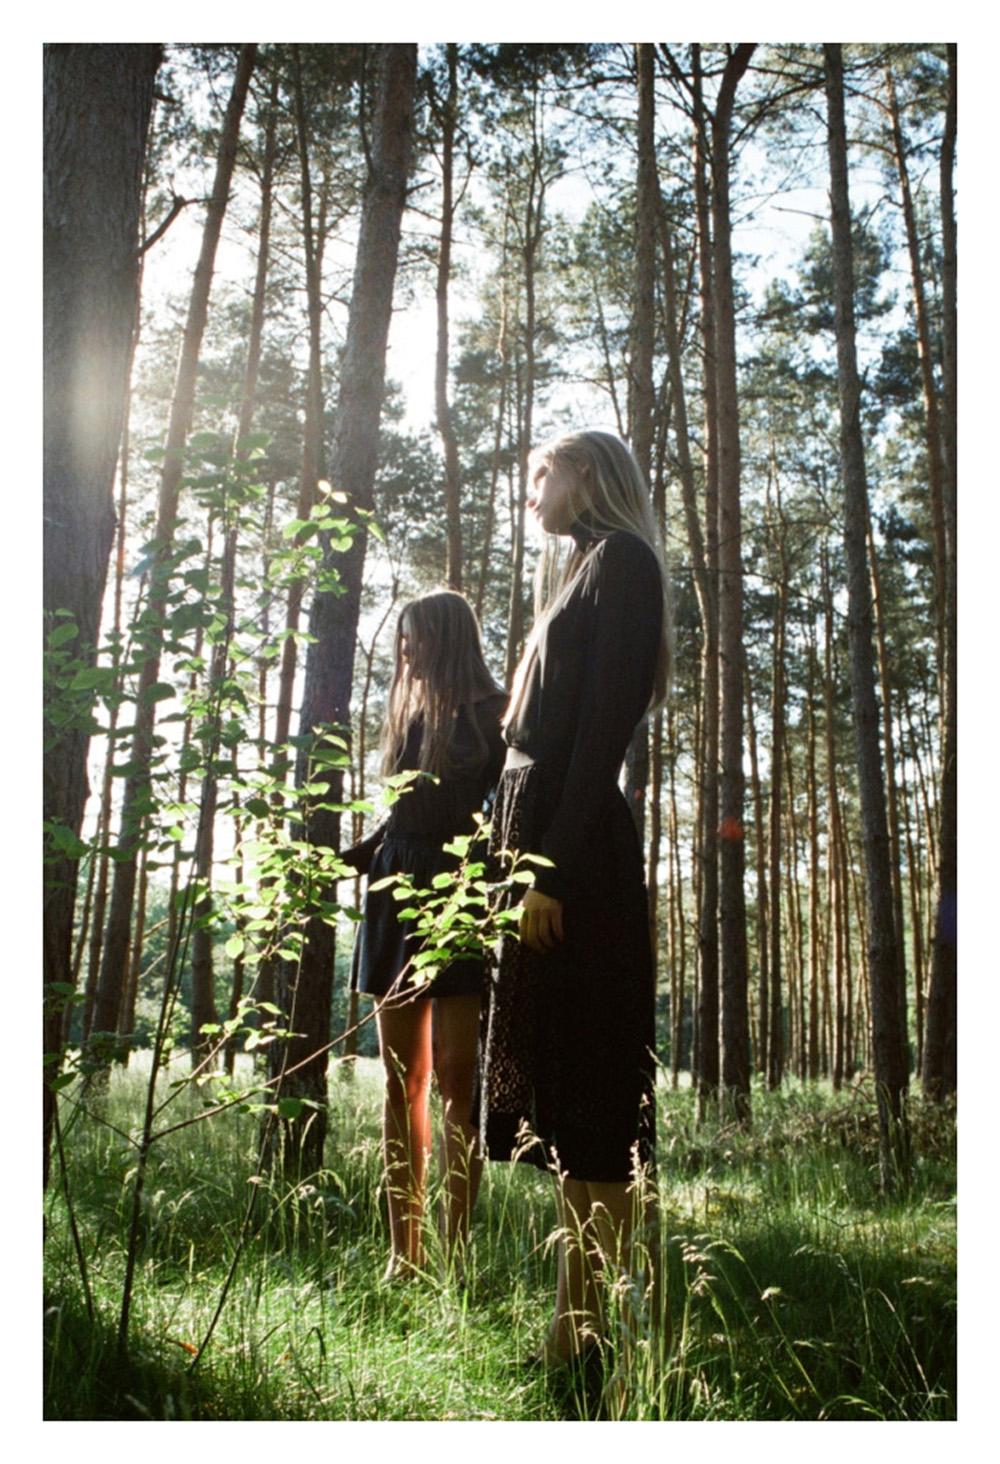 Inka-Neal-Hoeper-by-Lina-Scheynius-for-Zeit-Magazine-4.jpg